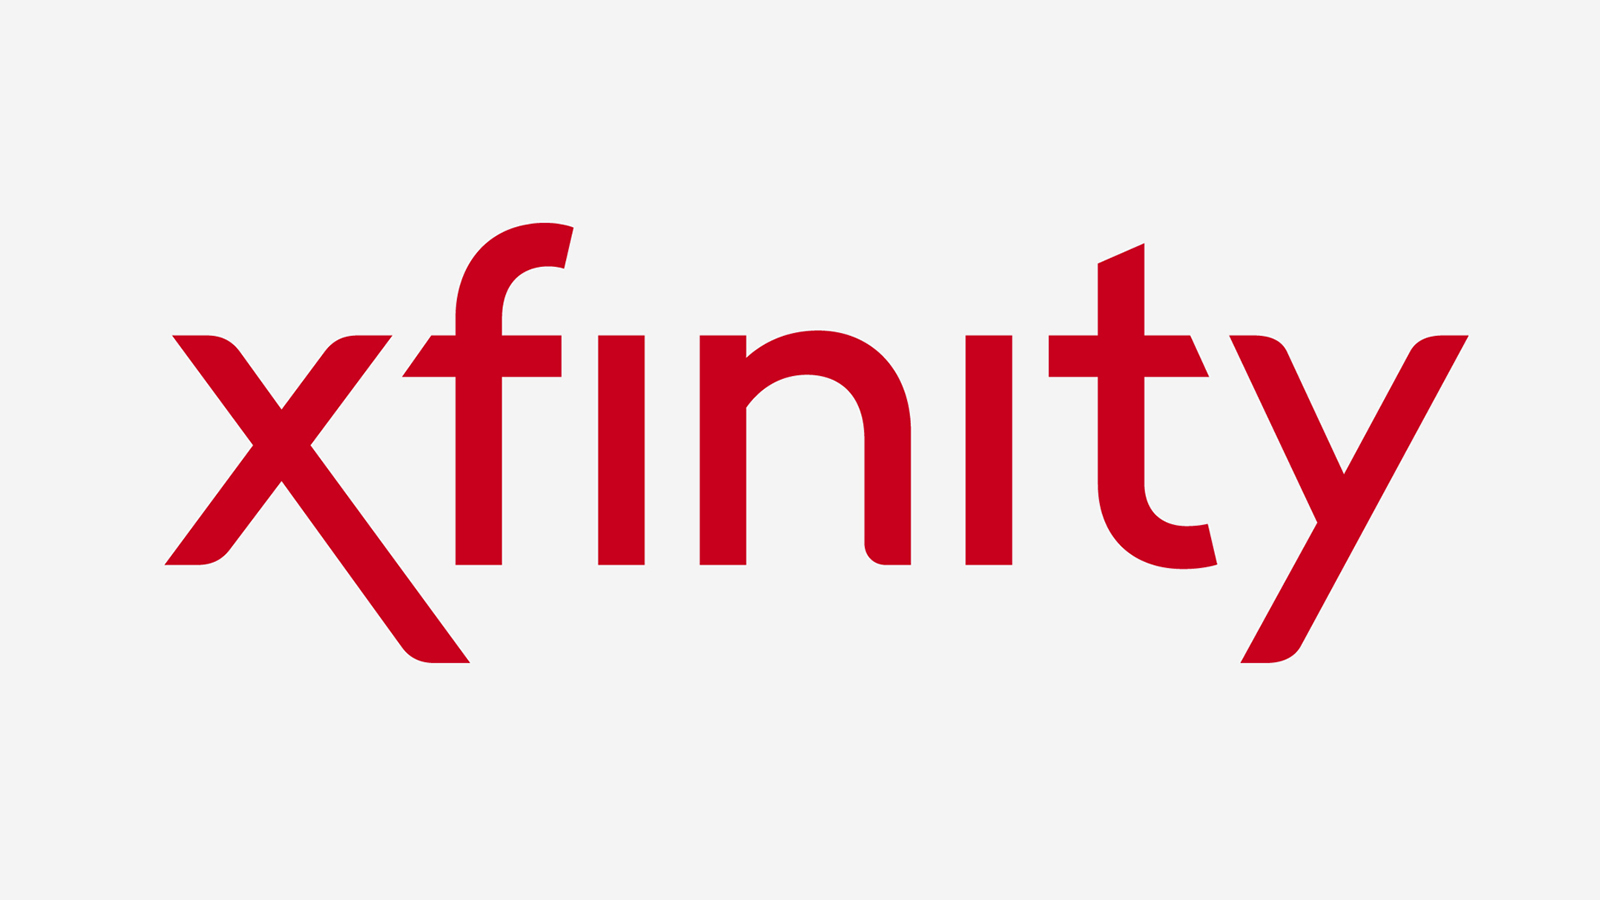 corporate_lgo-xfinity-r-final.jpg